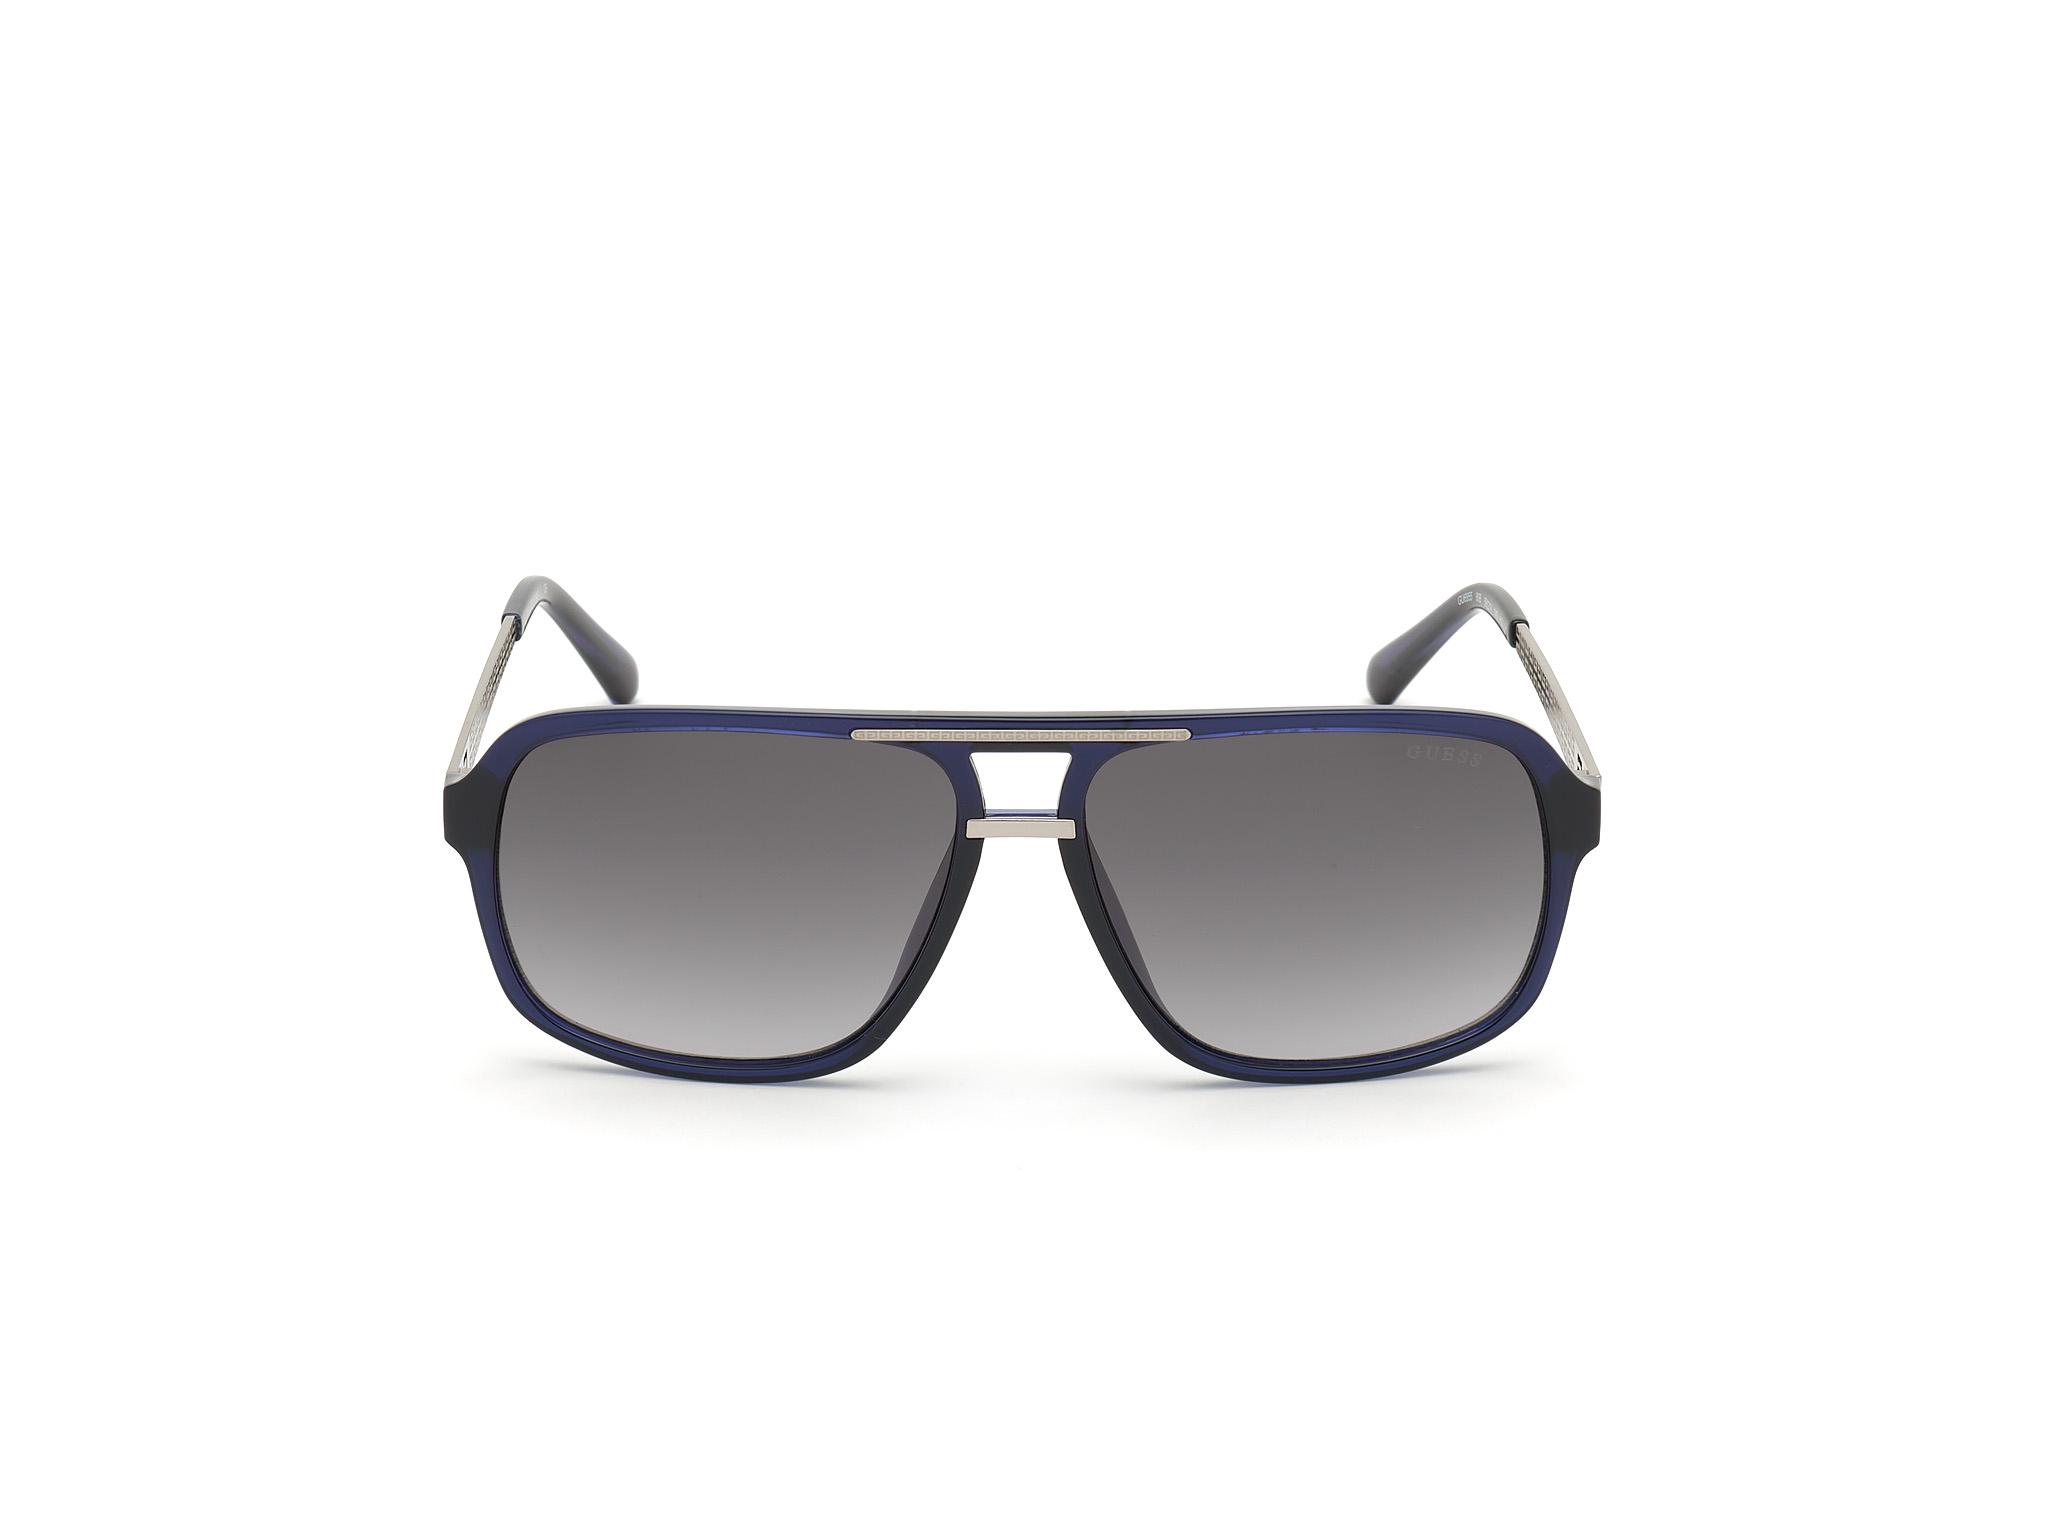 GUESS   Guess Blue Frame With Grey Lens Shield Shape Men Sunglass